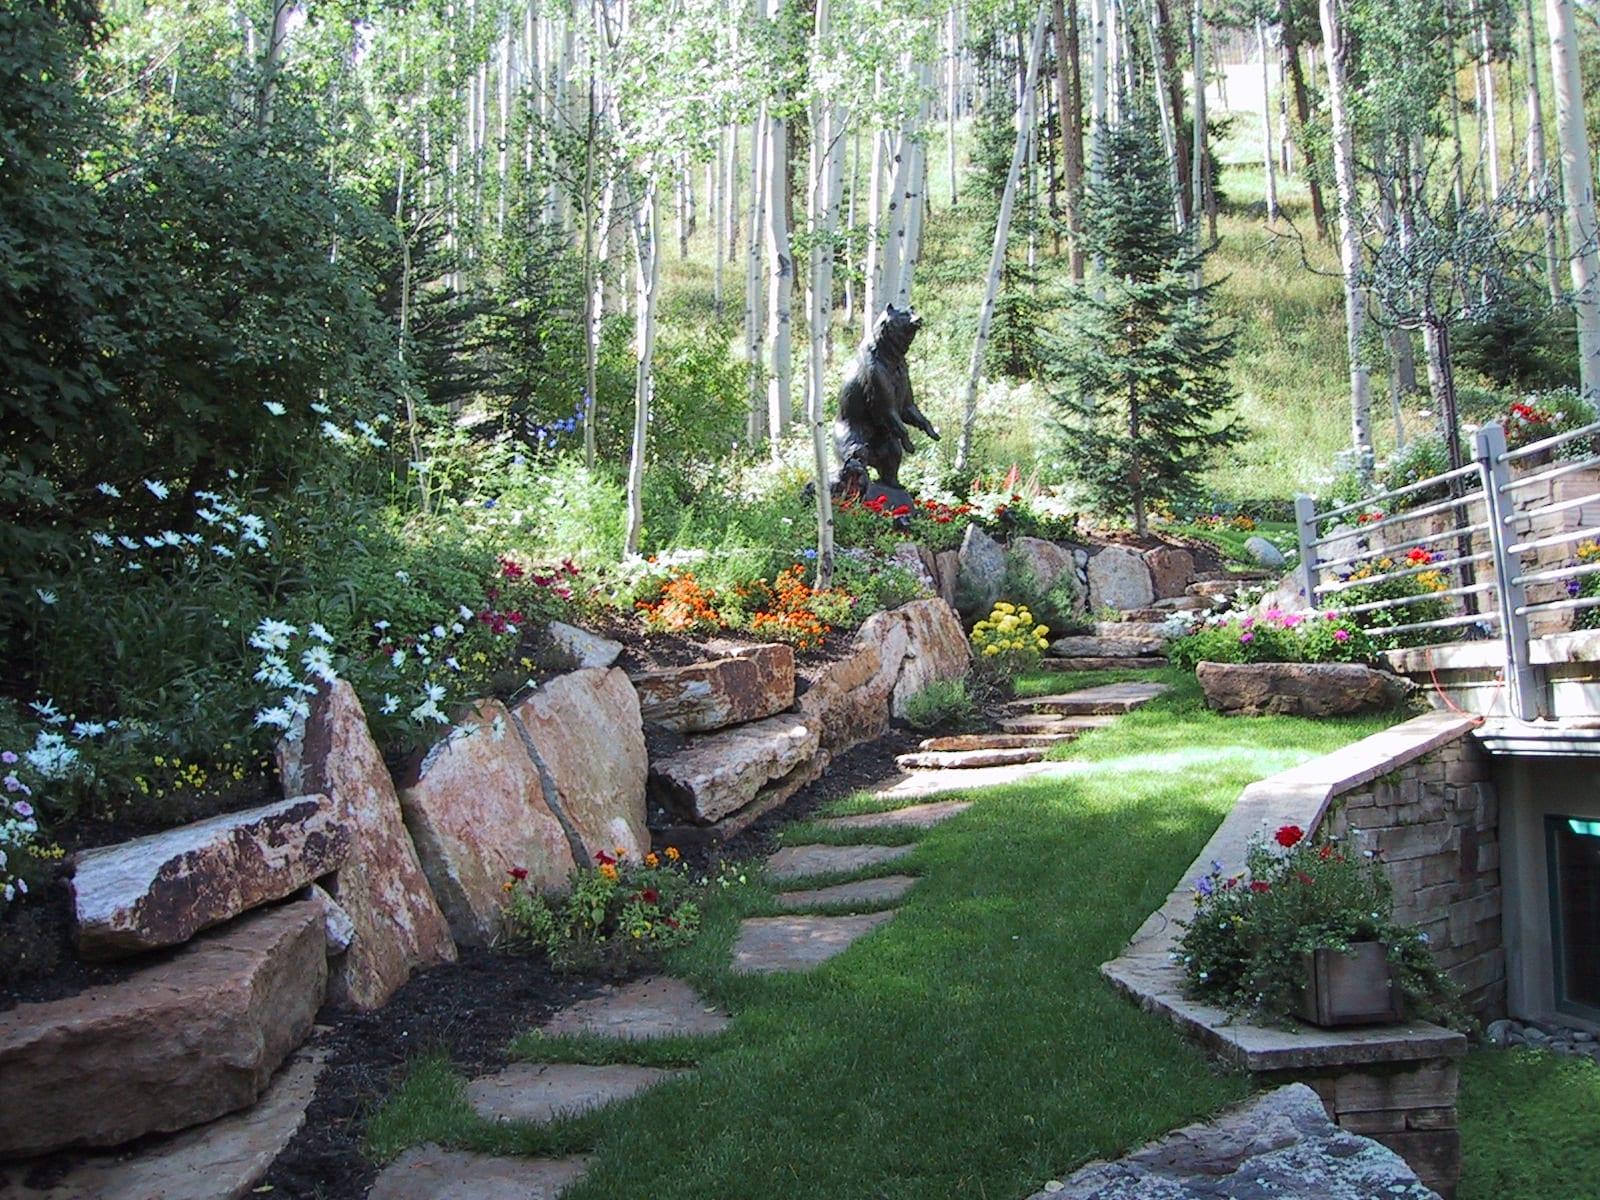 Landscaping Companies & Landscape Architecture - Vail, CO